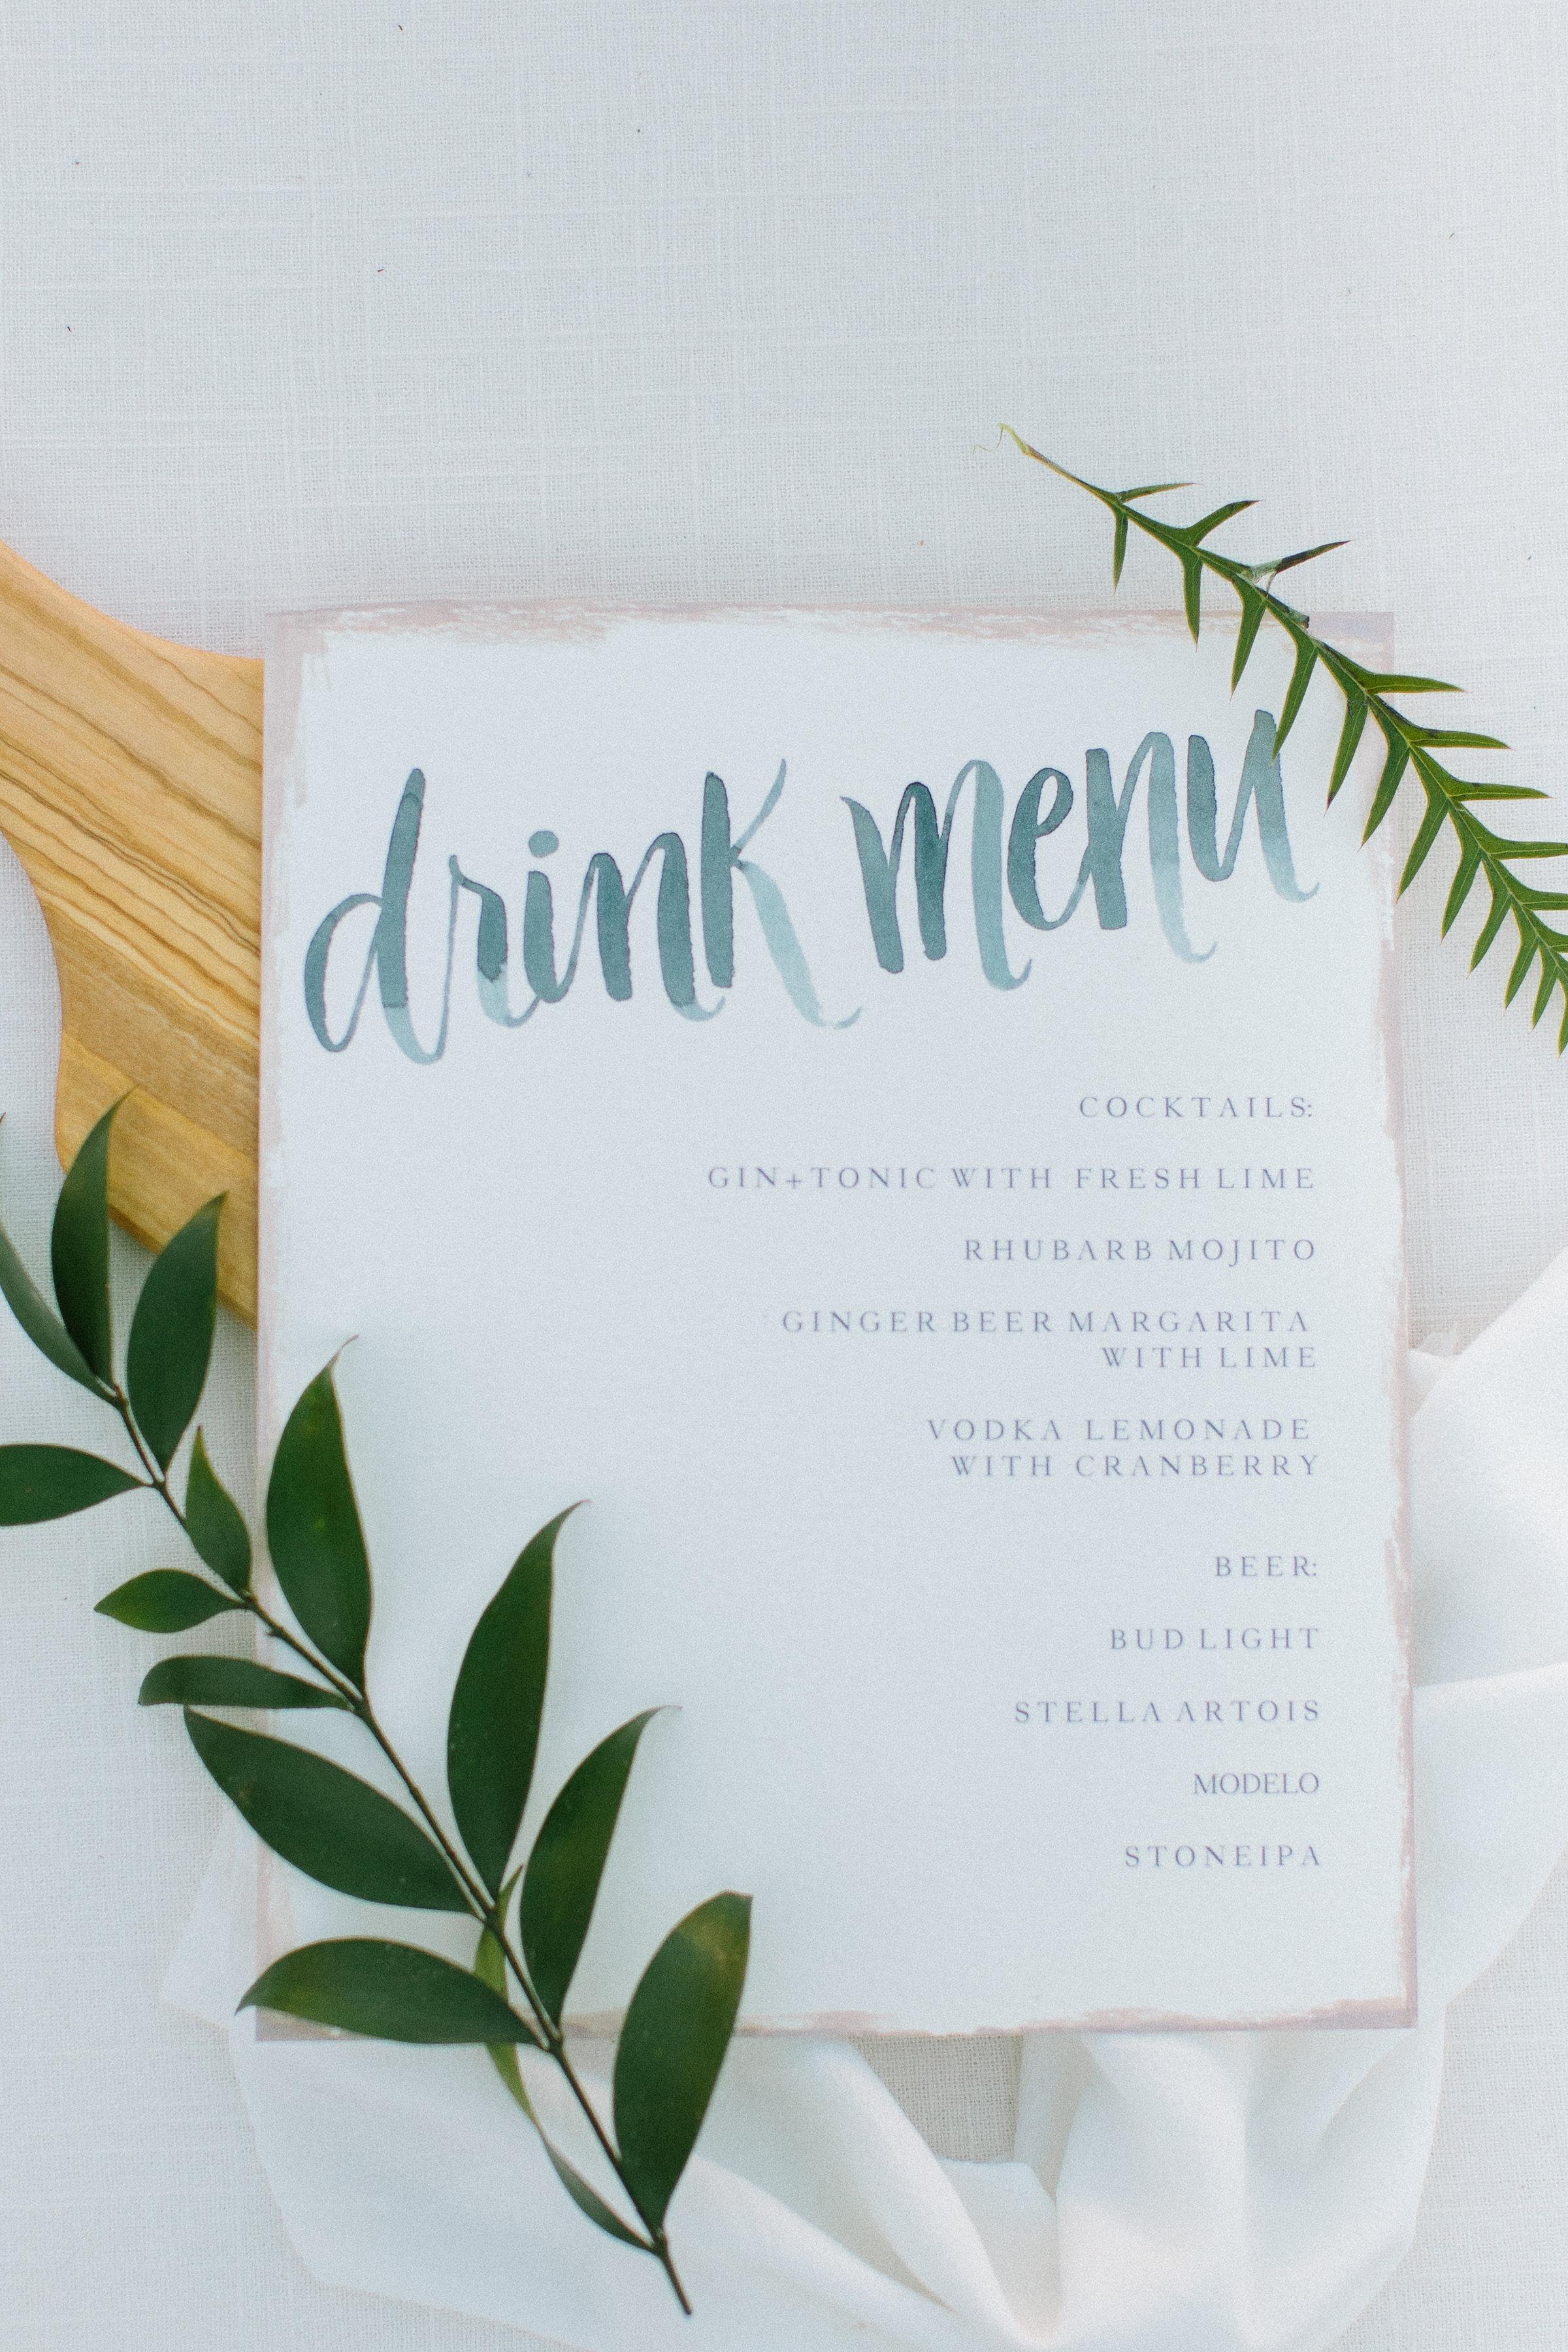 Ellen-Ashton-Photography-Peach-Creek-Ranch-Weddings-Wed-and-Prosper170